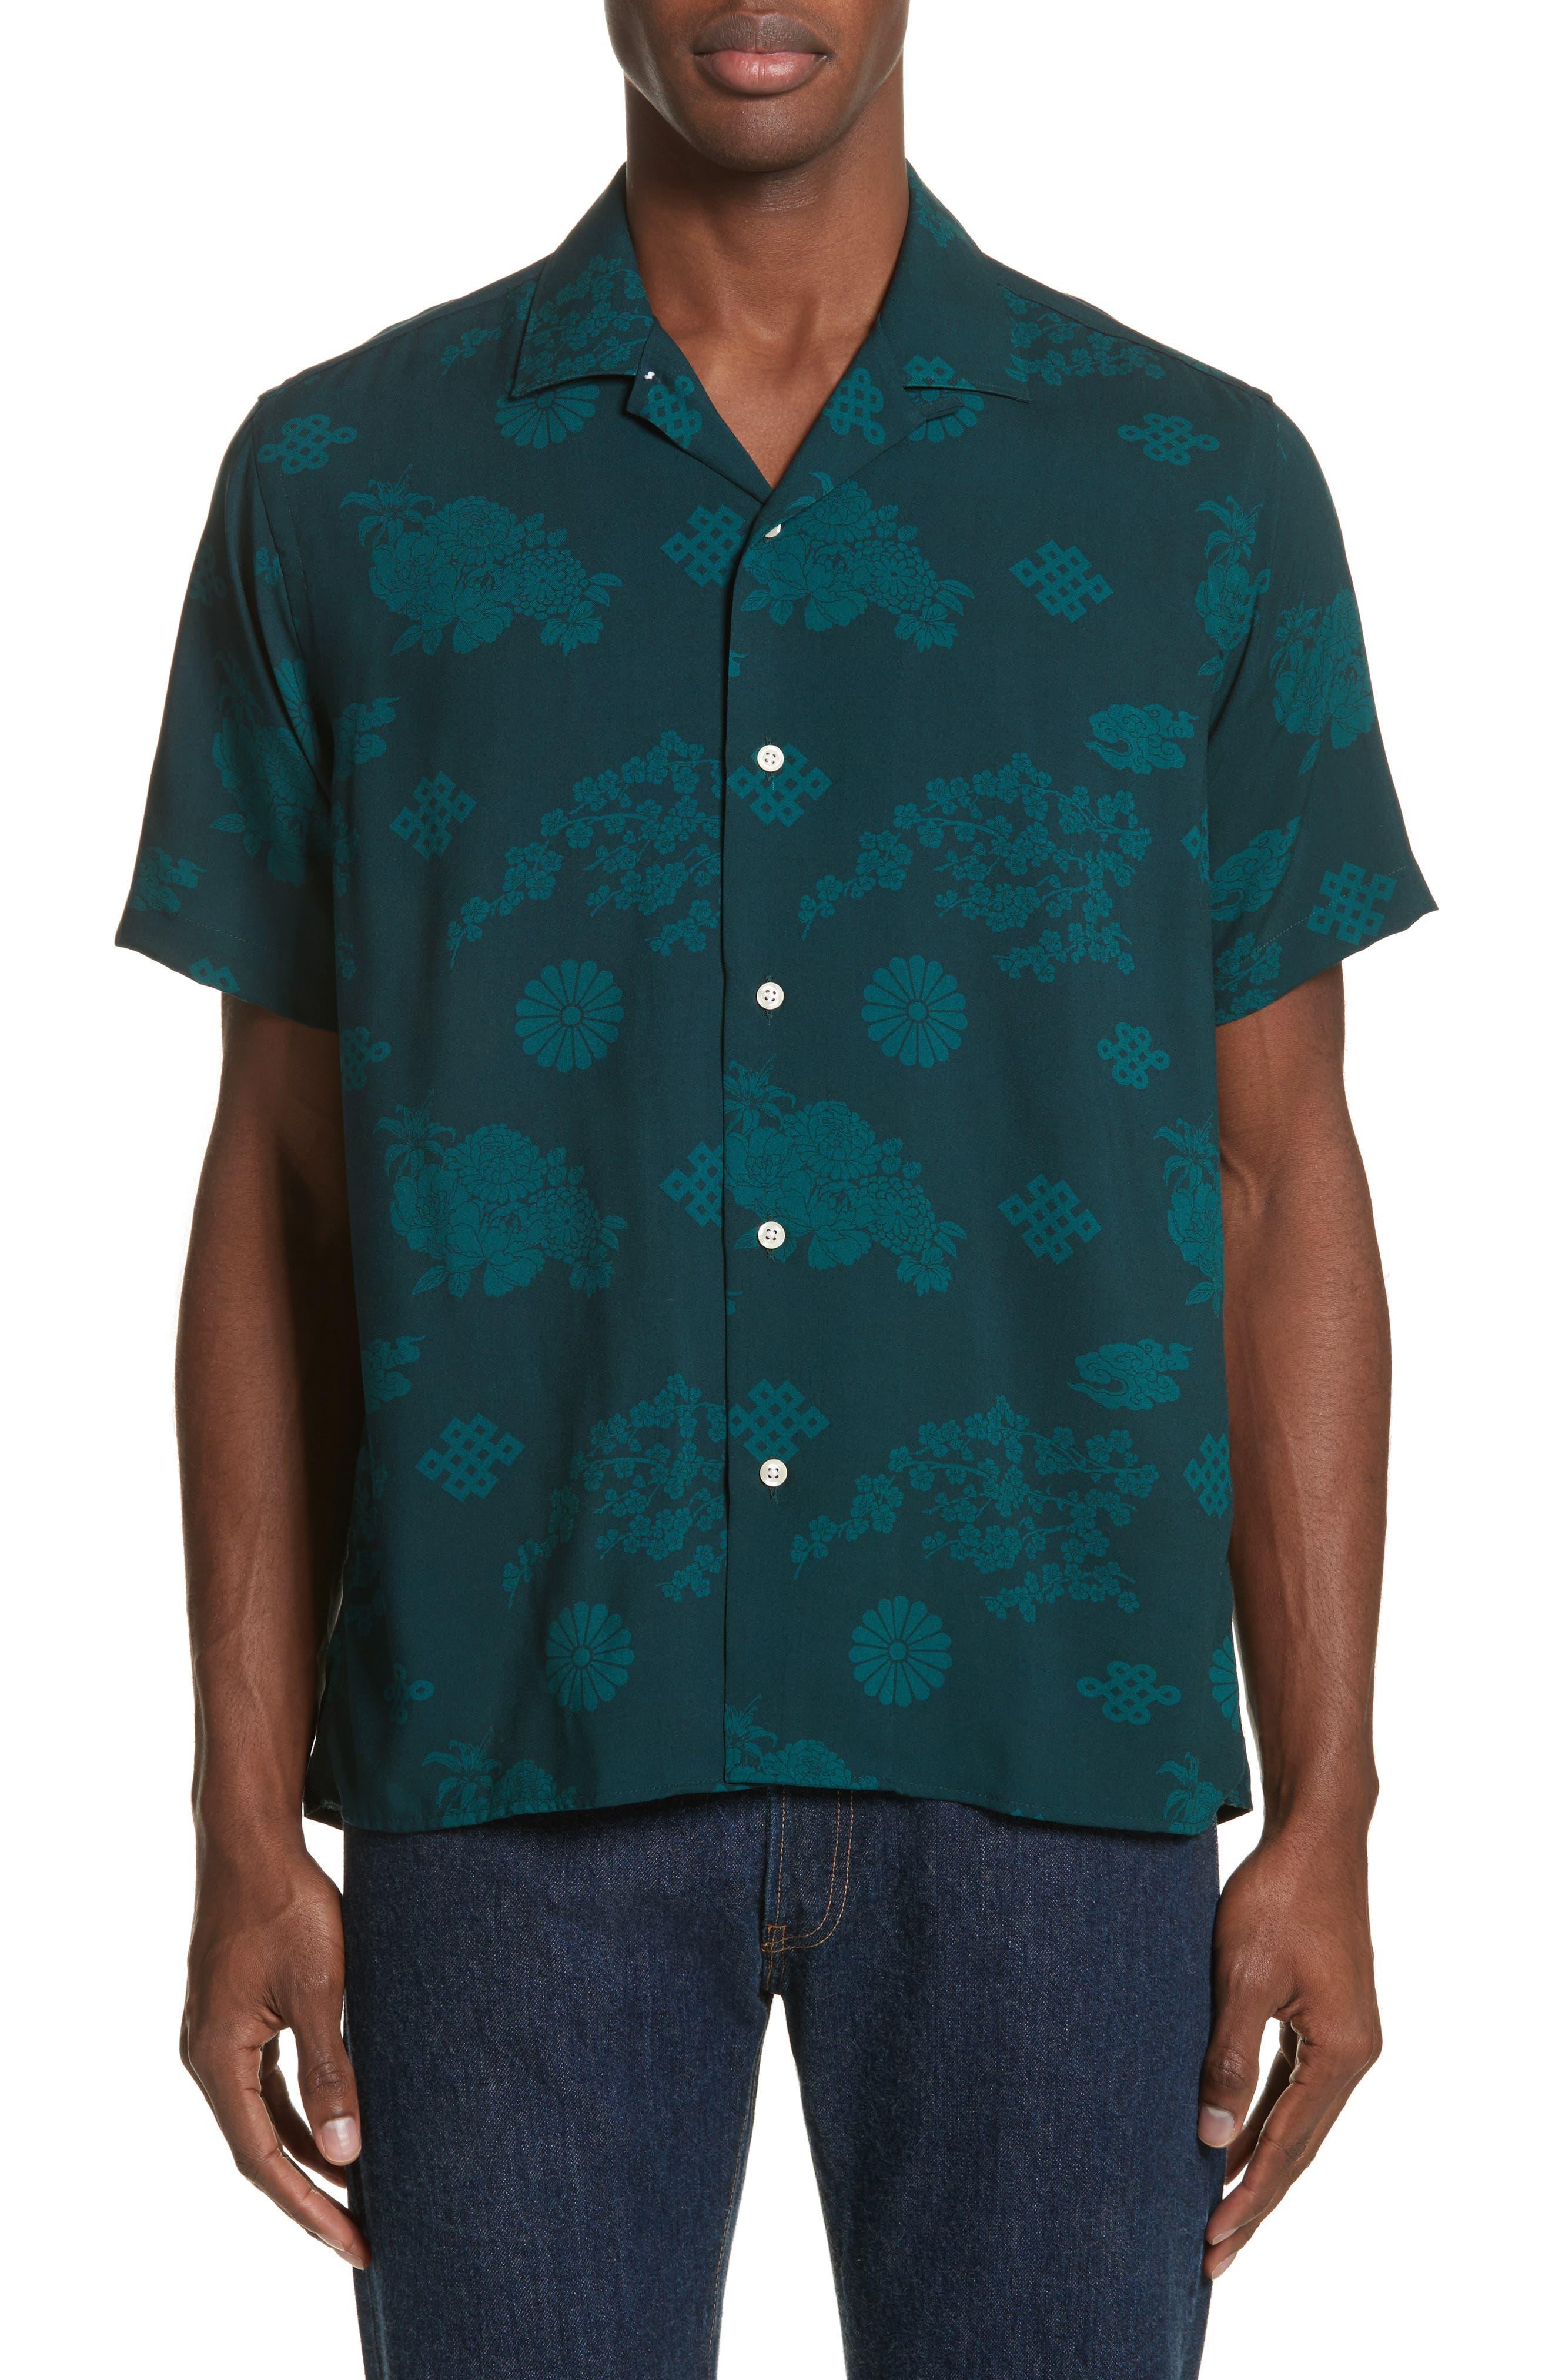 x The North Face Men's Floral Print Camp Shirt,                             Alternate thumbnail 2, color,                             300